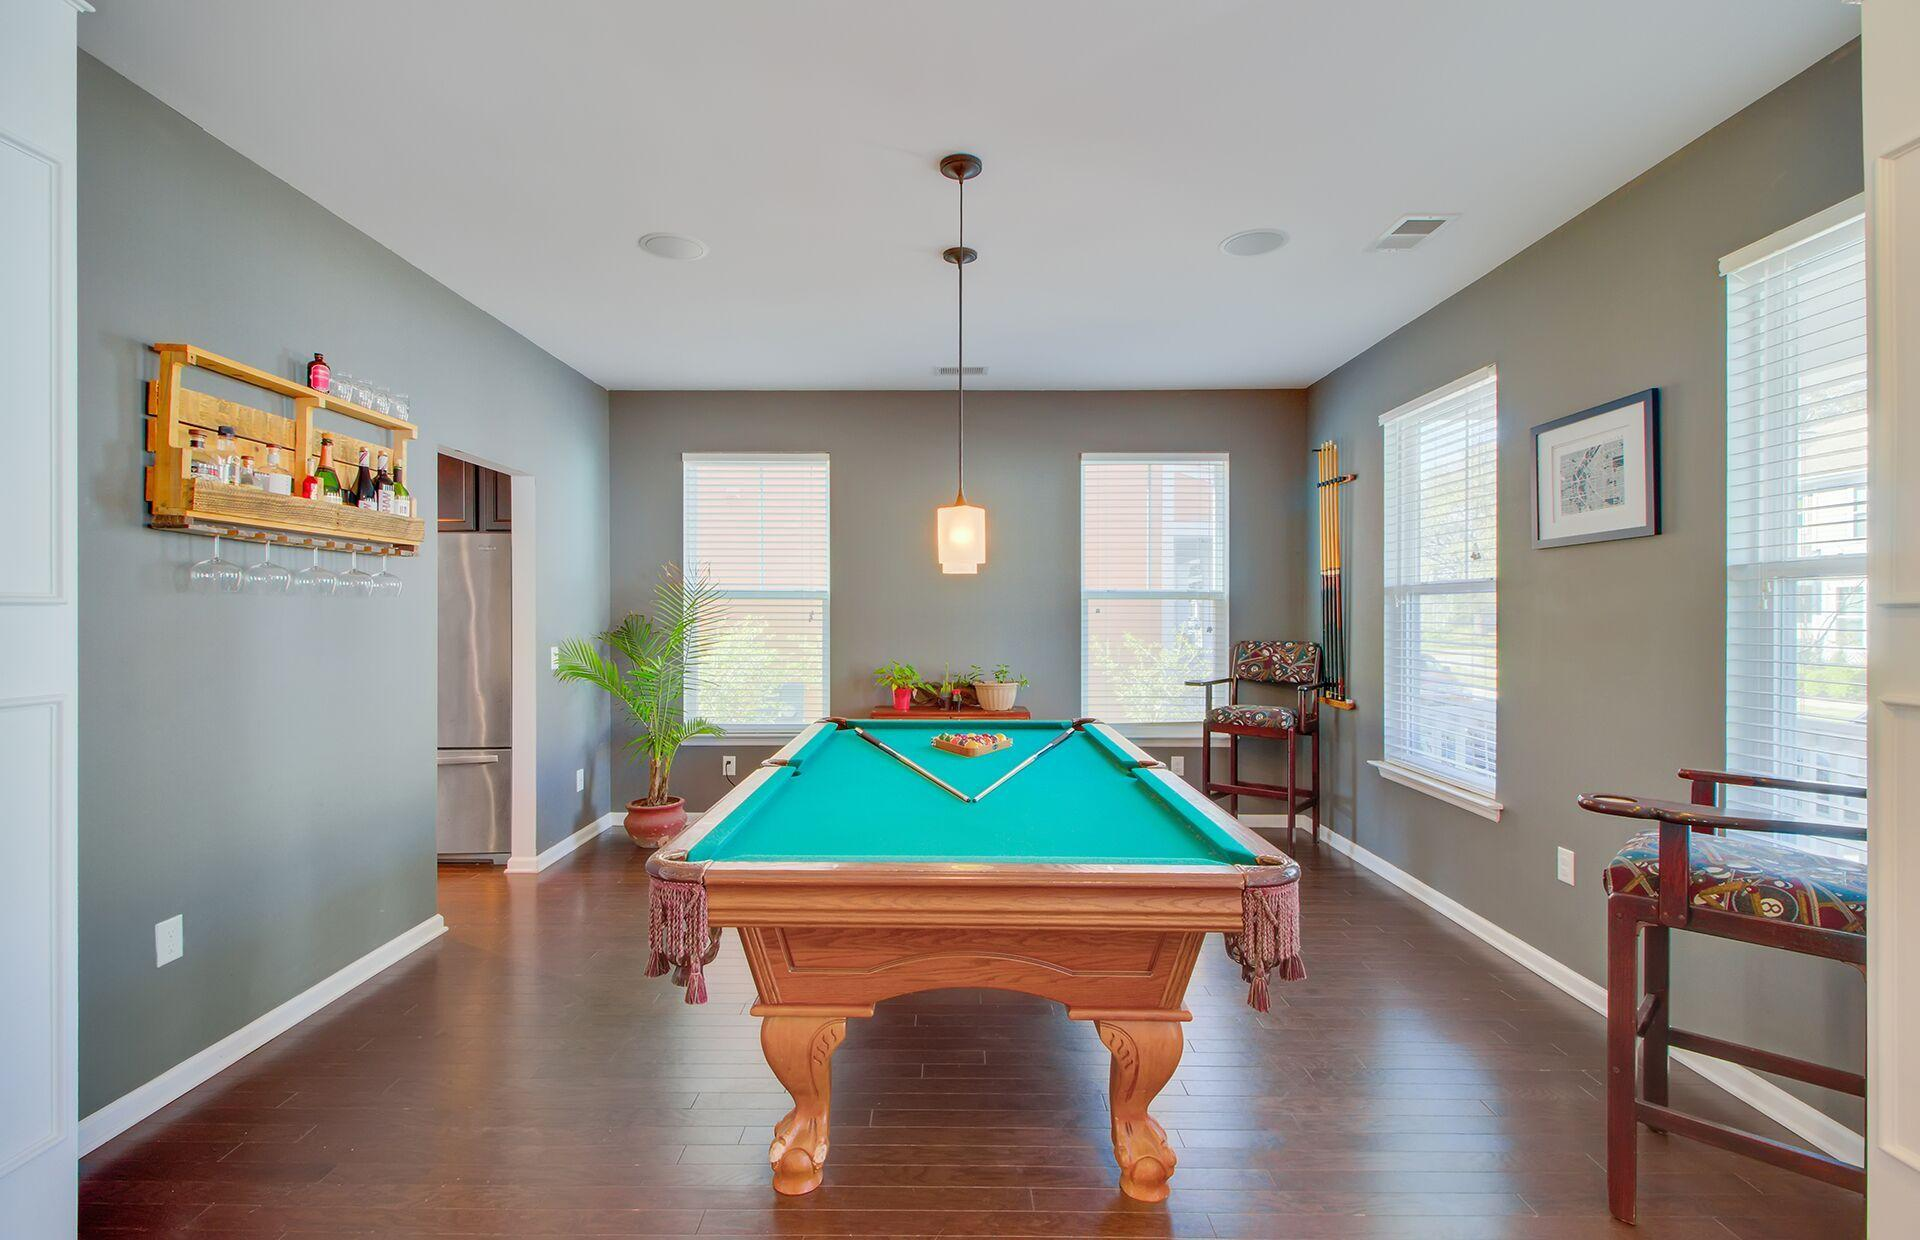 Oak Terrace Preserve Homes For Sale - 4967 Liberty Park, North Charleston, SC - 5